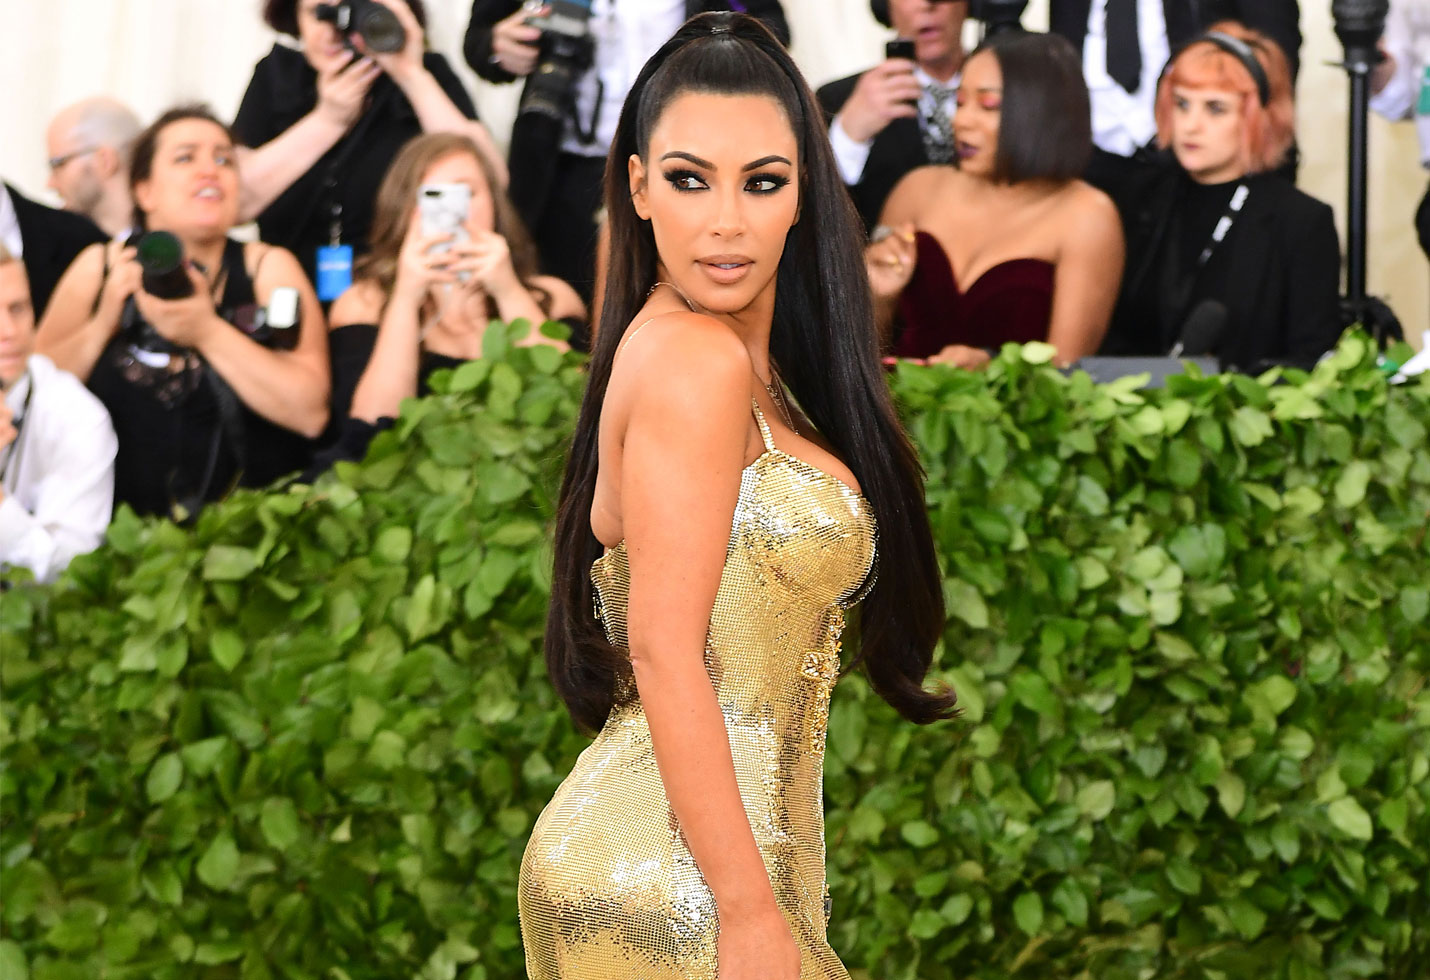 Kim Kardashian NSFW Bikini Trampoline Video